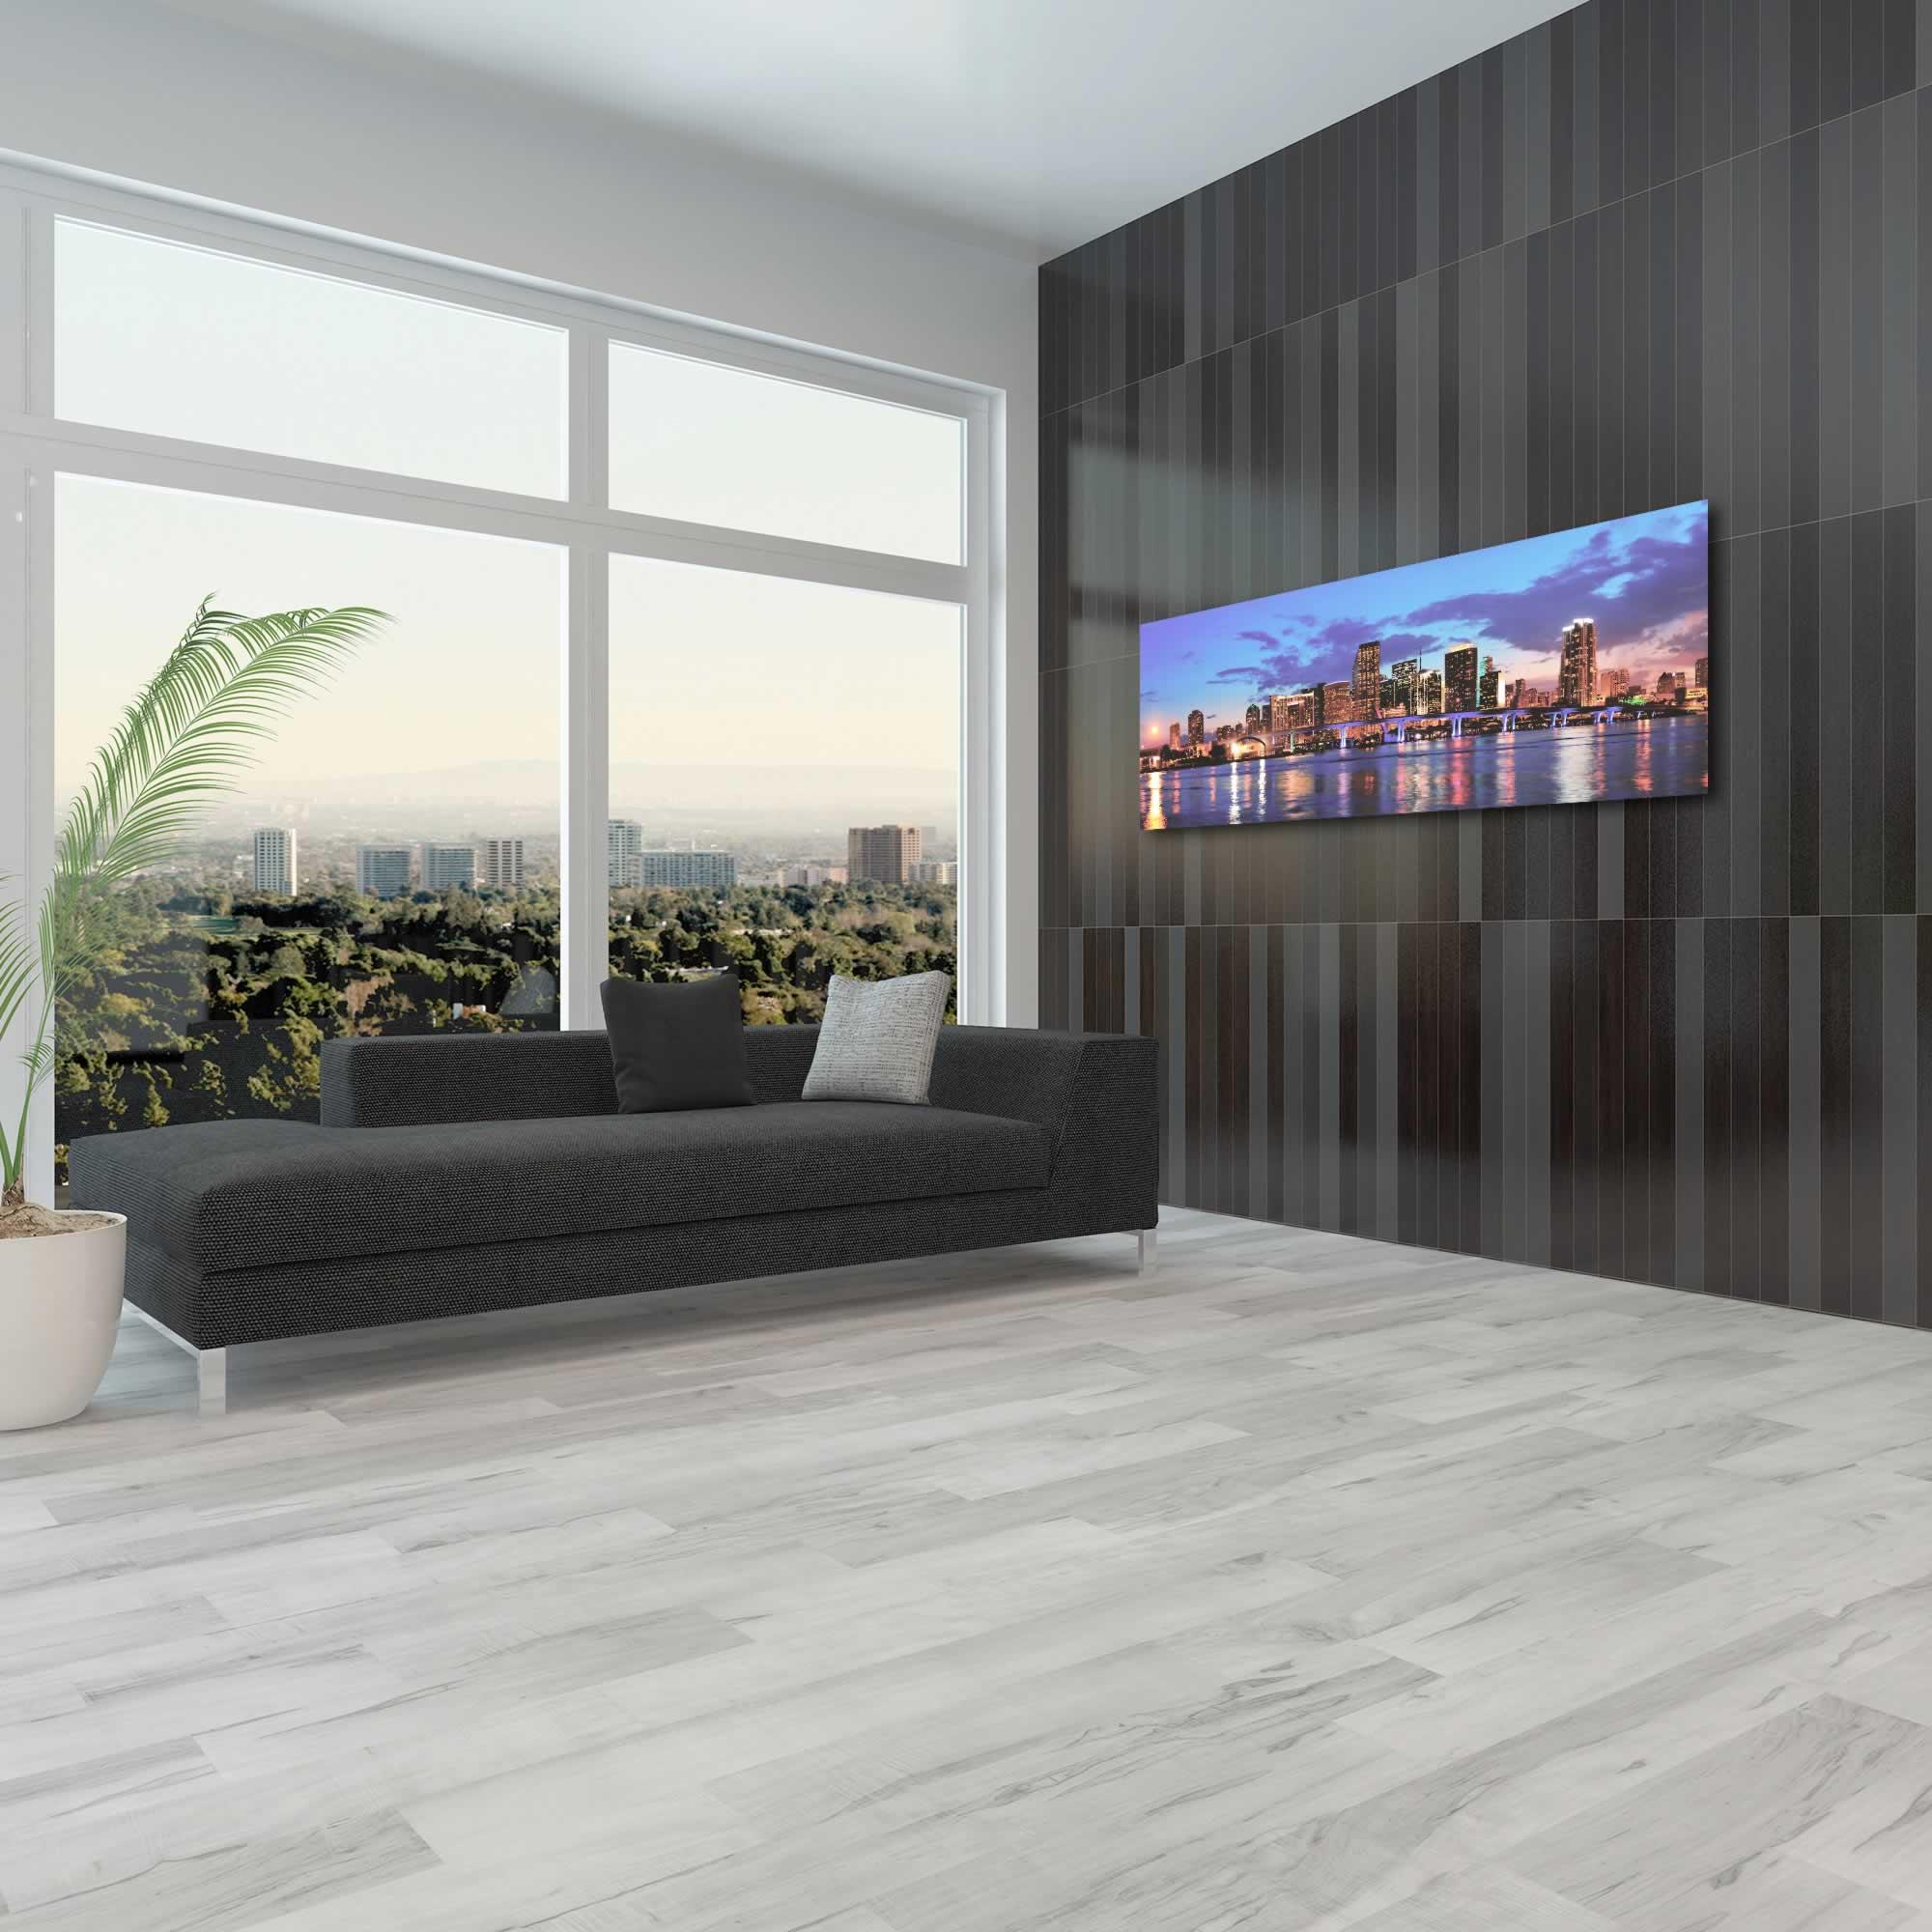 Miami City Skyline - Urban Modern Art, Designer Home Decor, Cityscape Wall Artwork, Trendy Contemporary Art - Alternate View 3